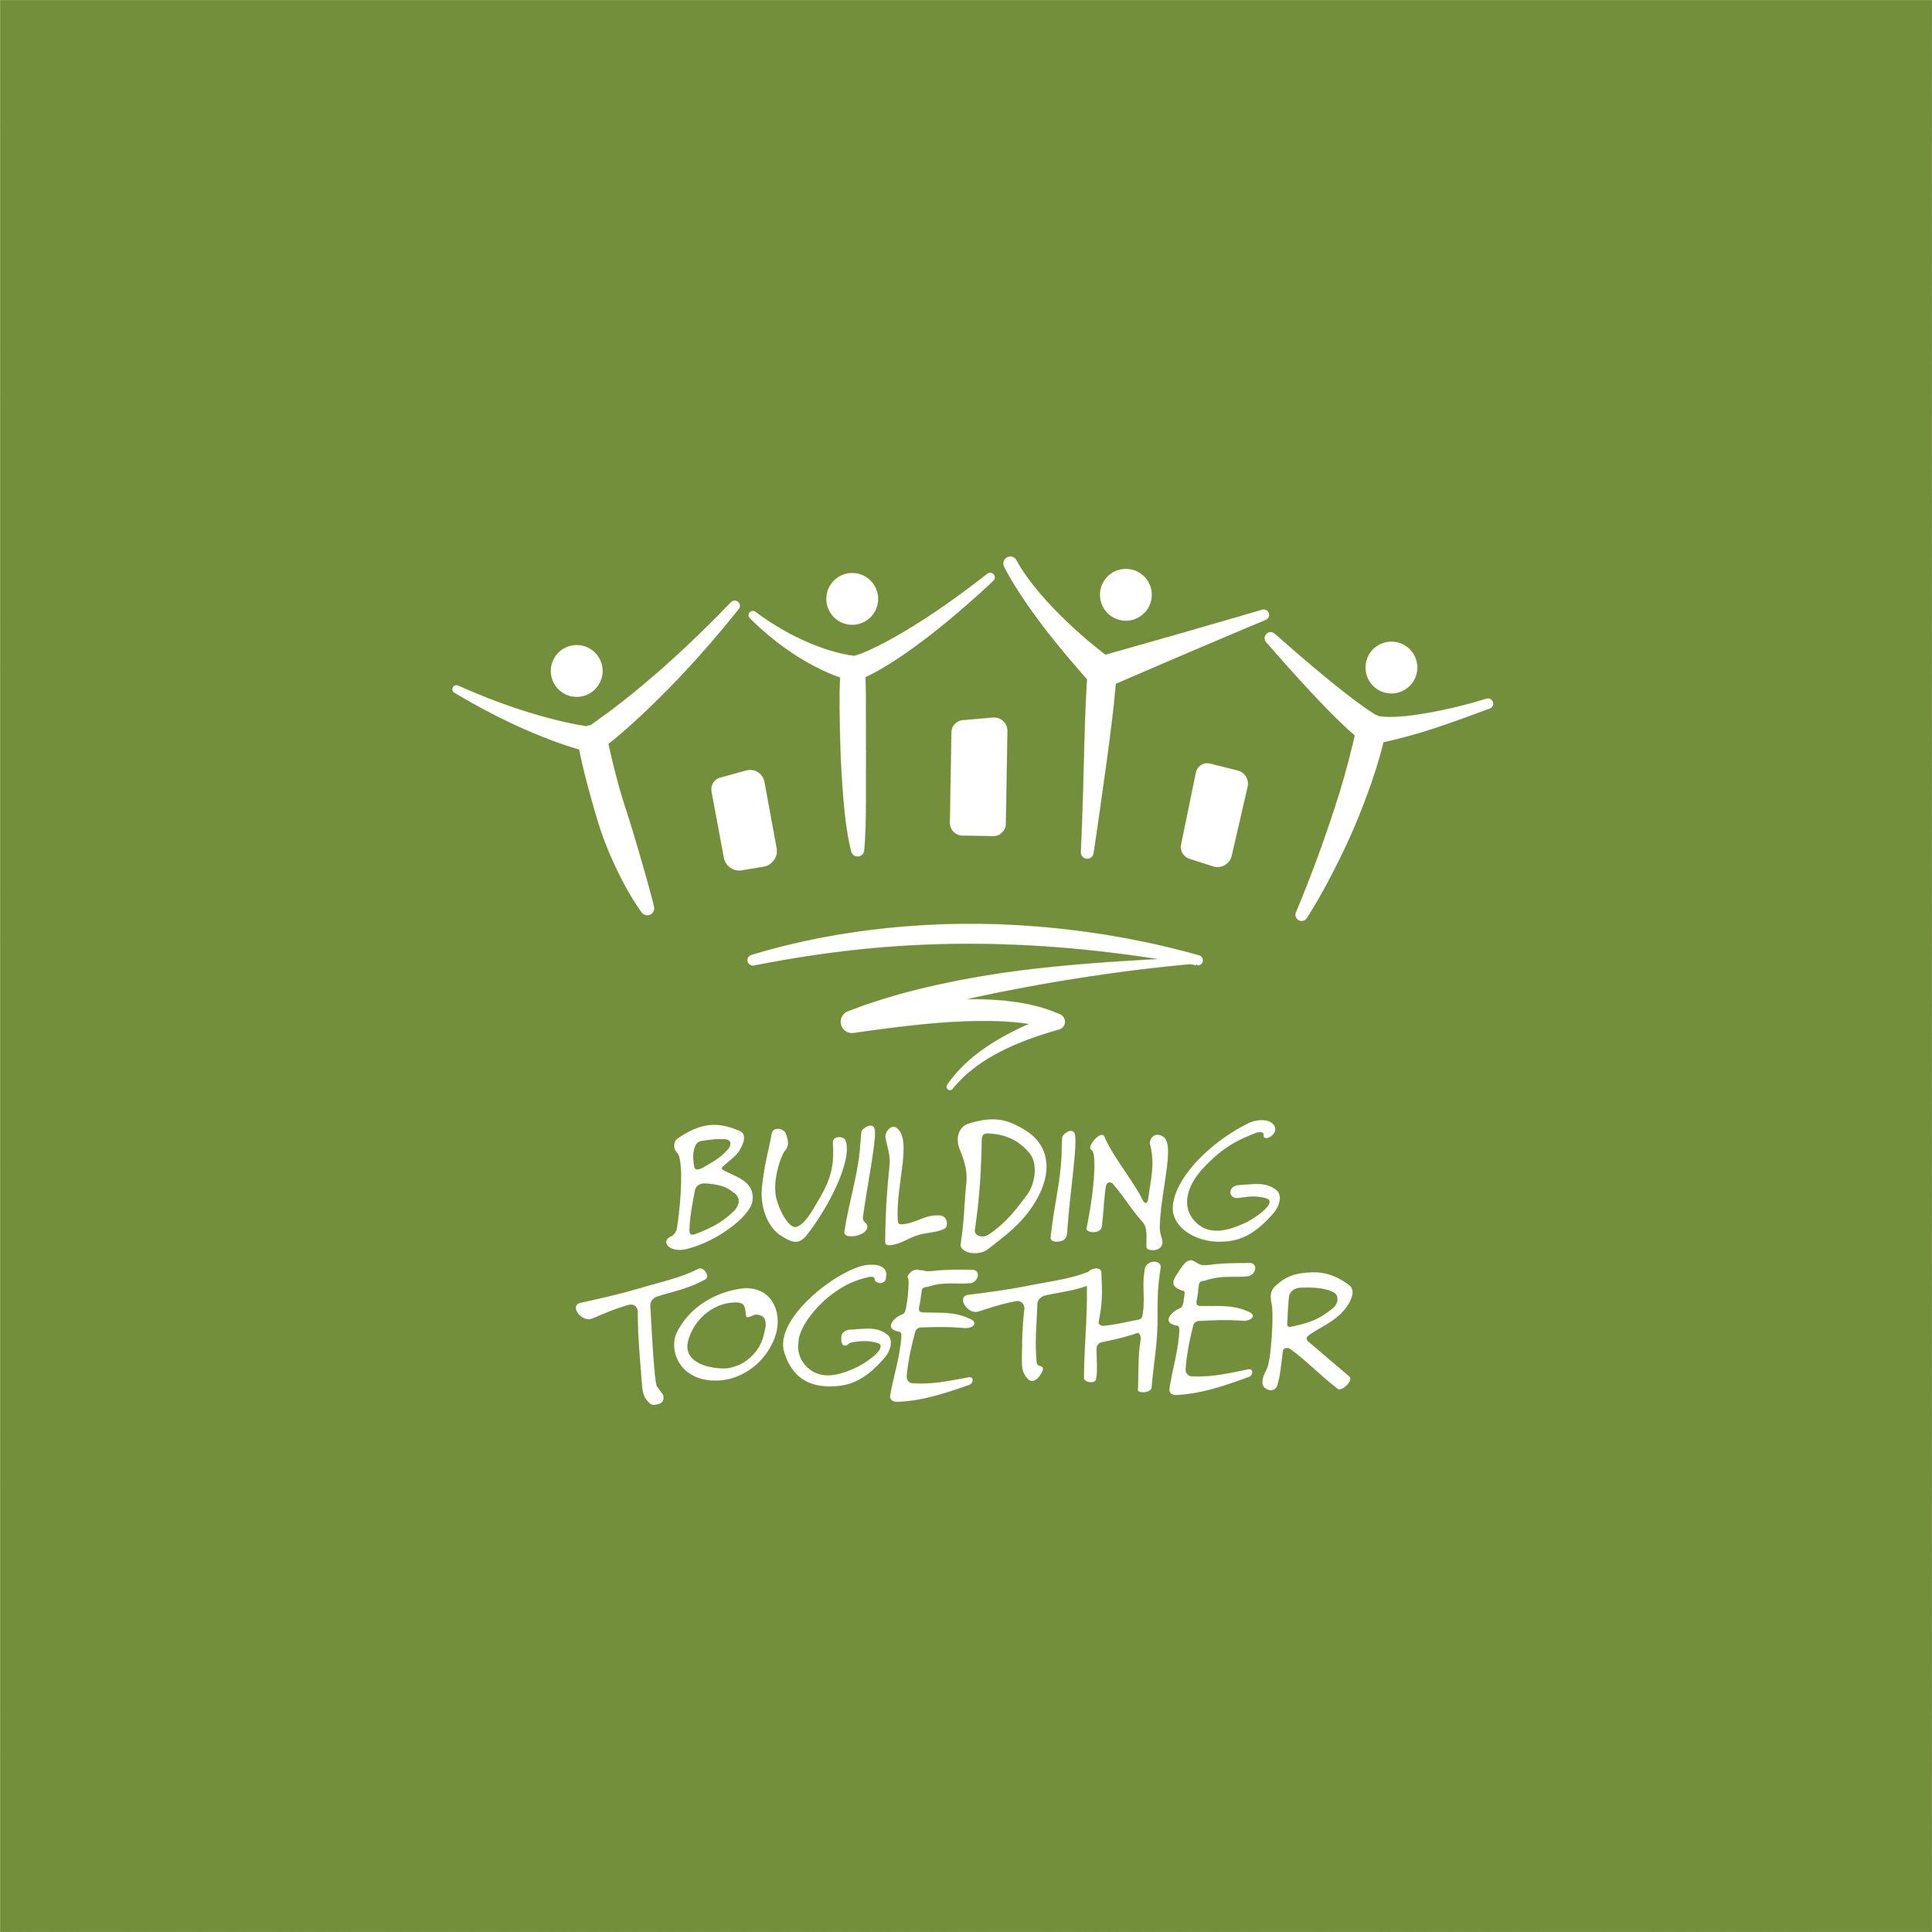 Logo_B.Green_F.White.jpg